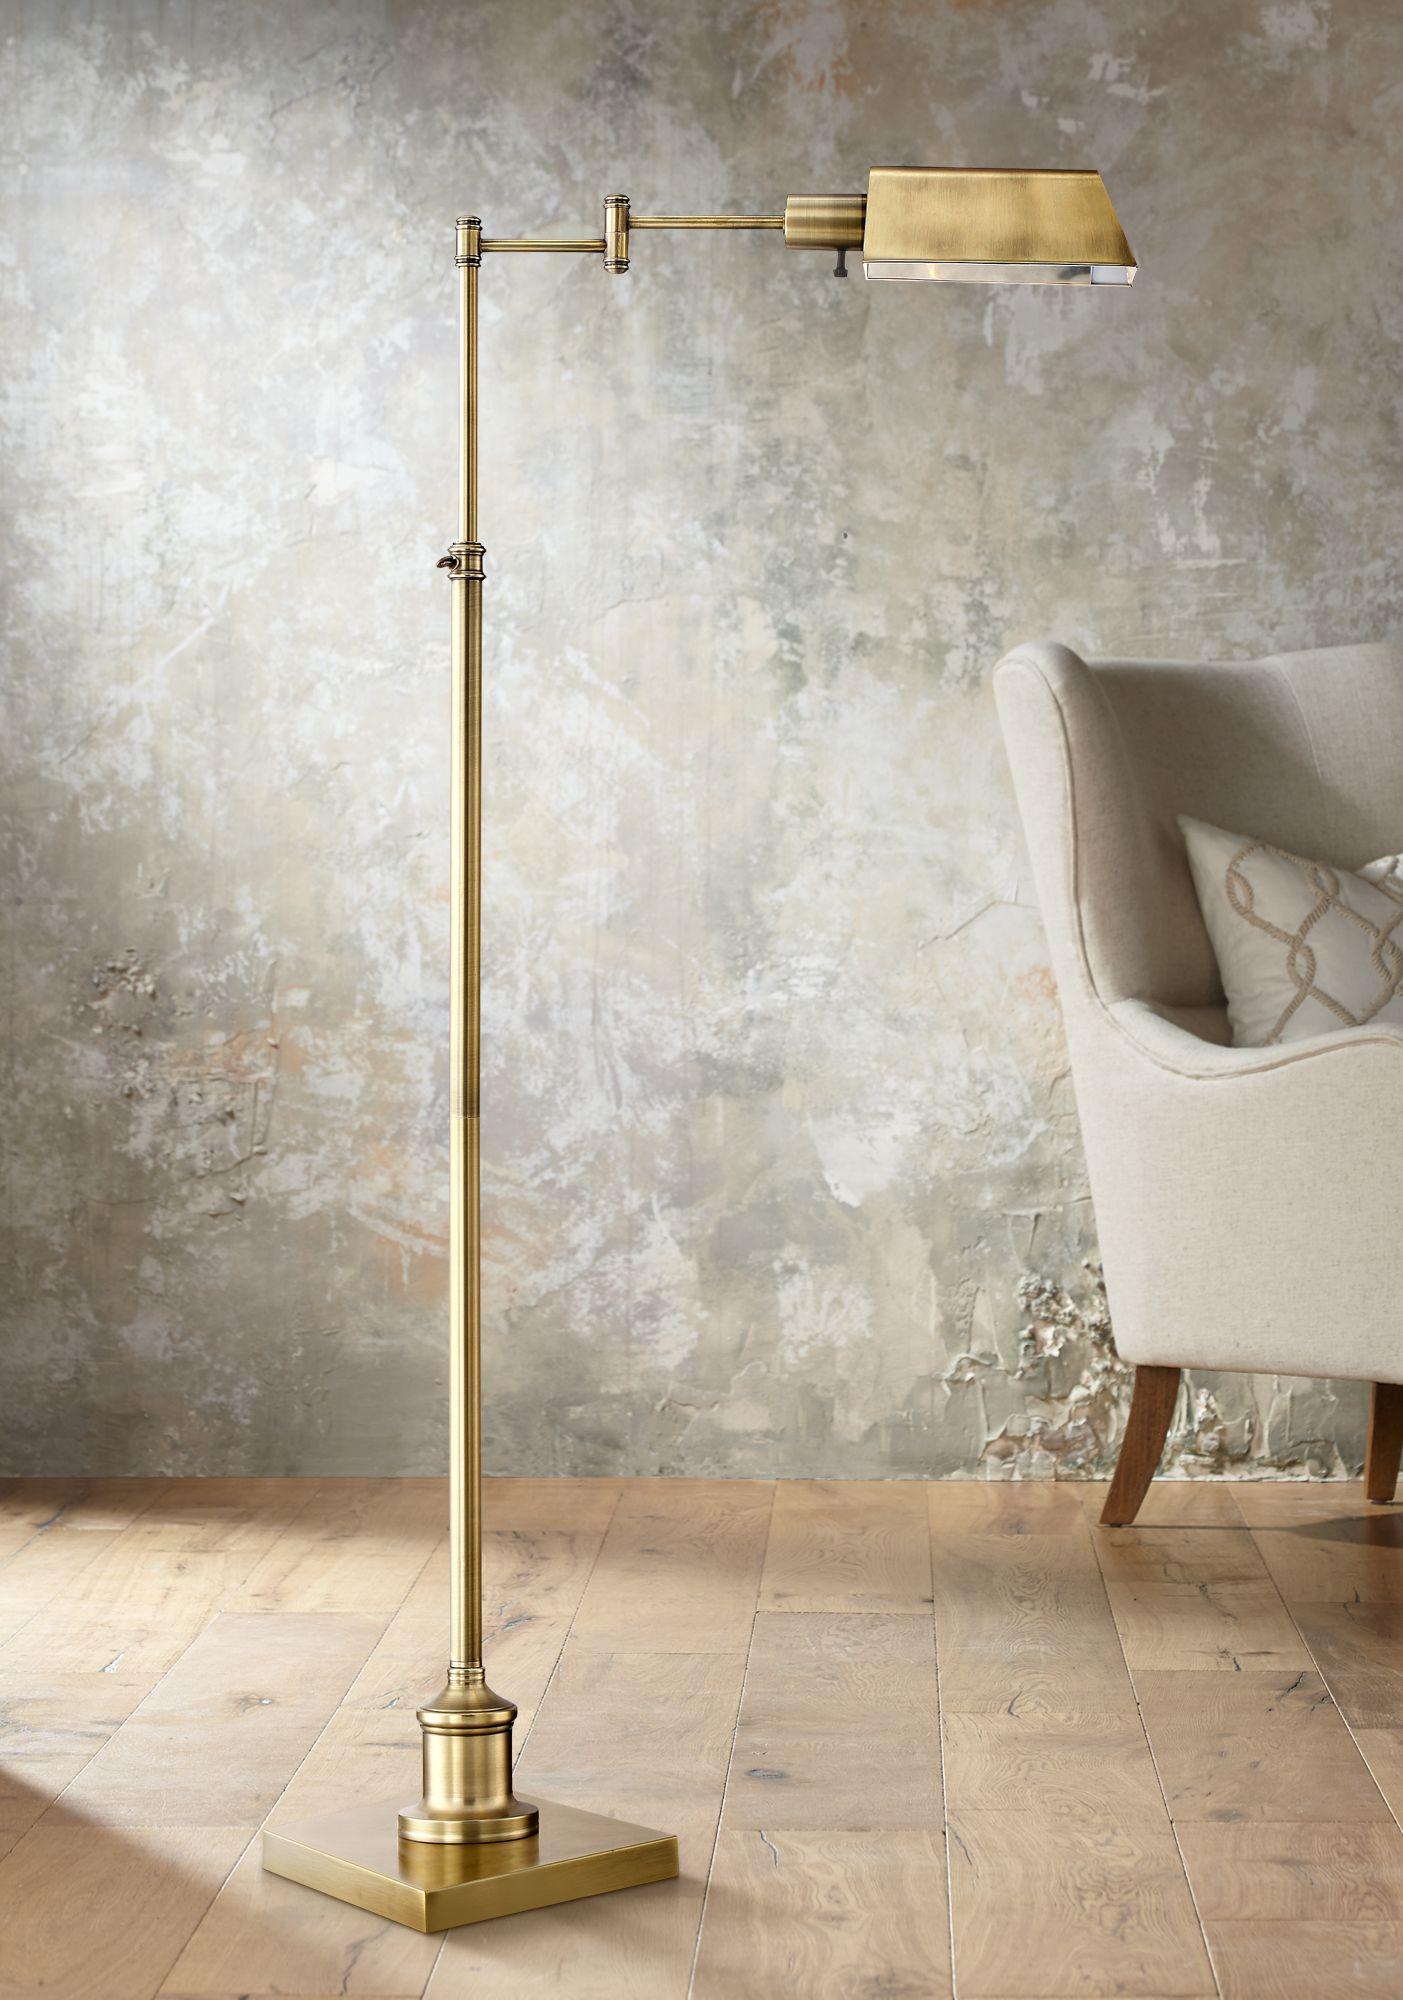 Brass - Antique Brass, Swing Arm, Floor Lamps | Lamps Plus